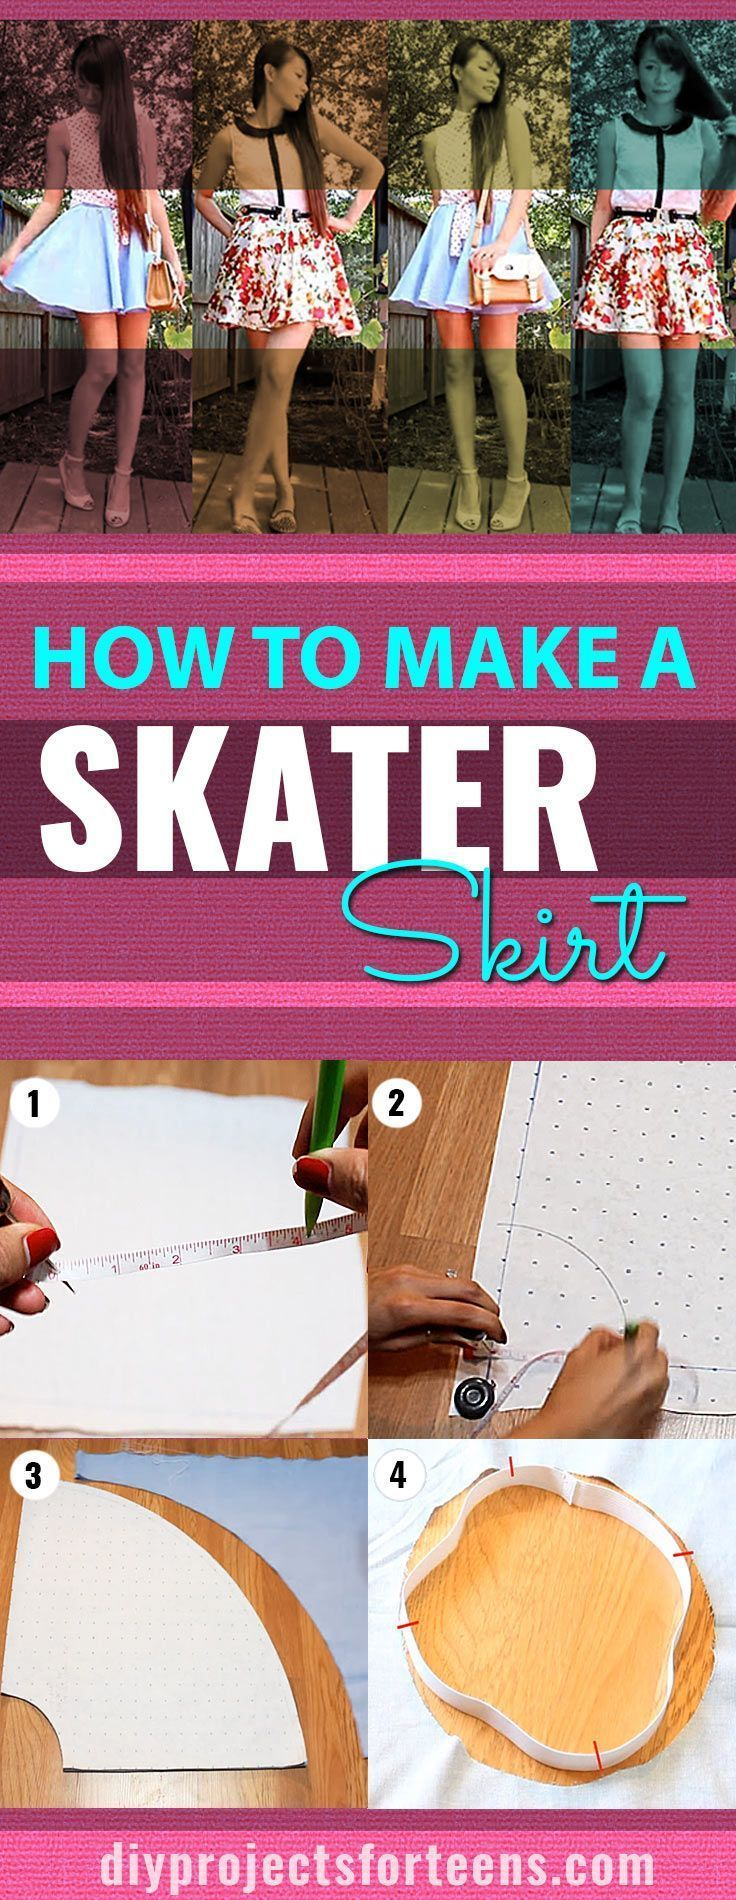 DIY Fashion for Teens Cool Skater